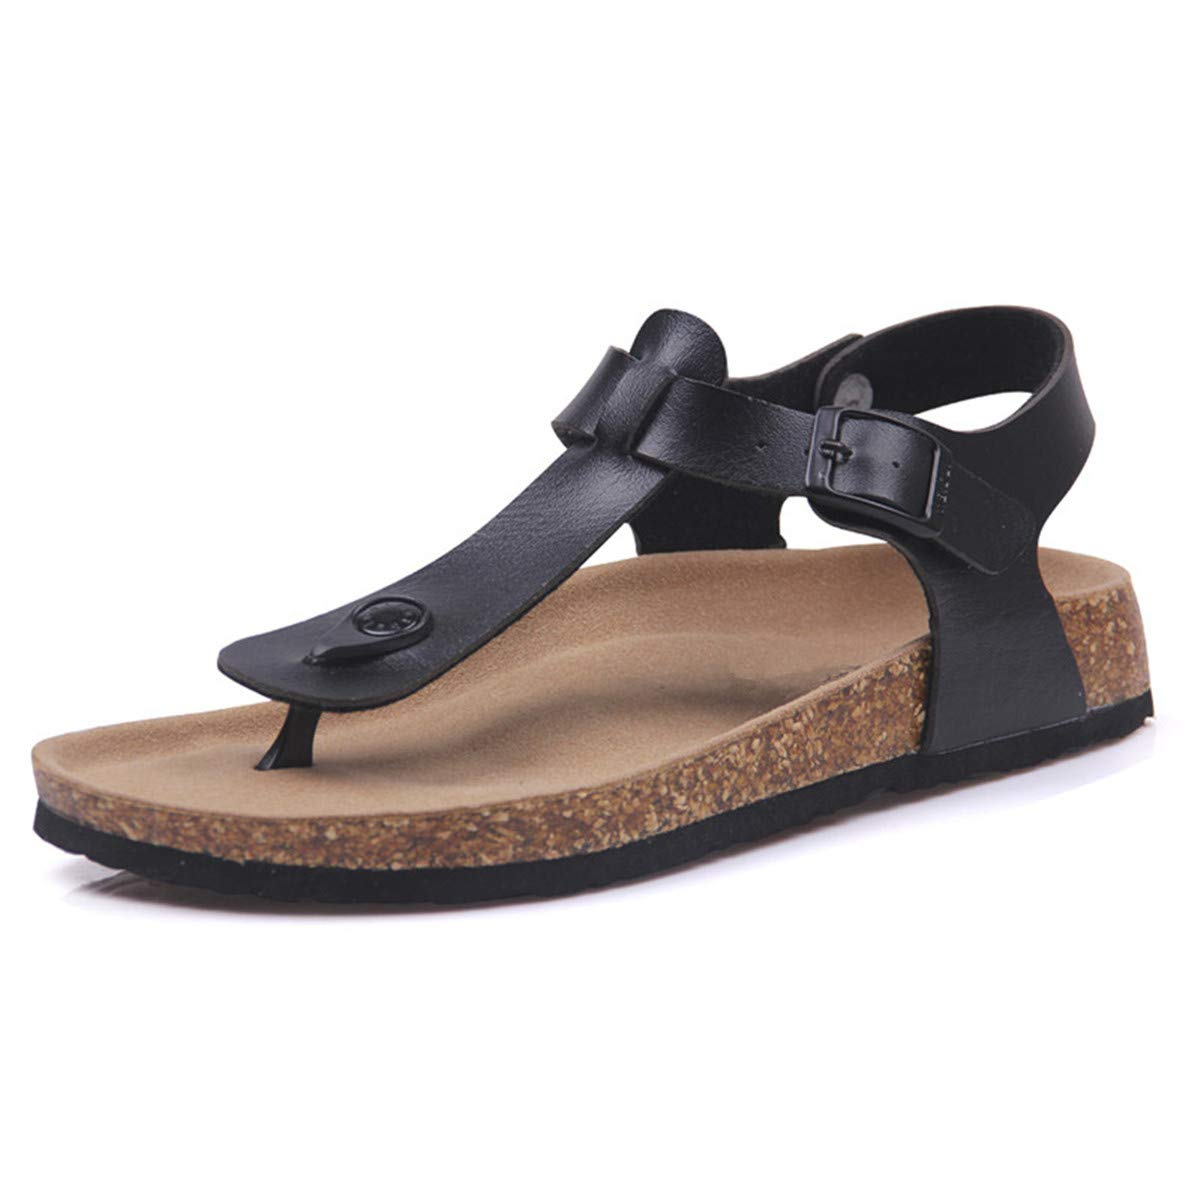 Micca Bacain Fashion Cork Sandals Flip New Women Summer Buckle Strap Solid Beach Slipper Flip Sandals Flops Sandals Shoe Flat Plus Size B07GBV4MM2 5 M US|Beige c3ca28